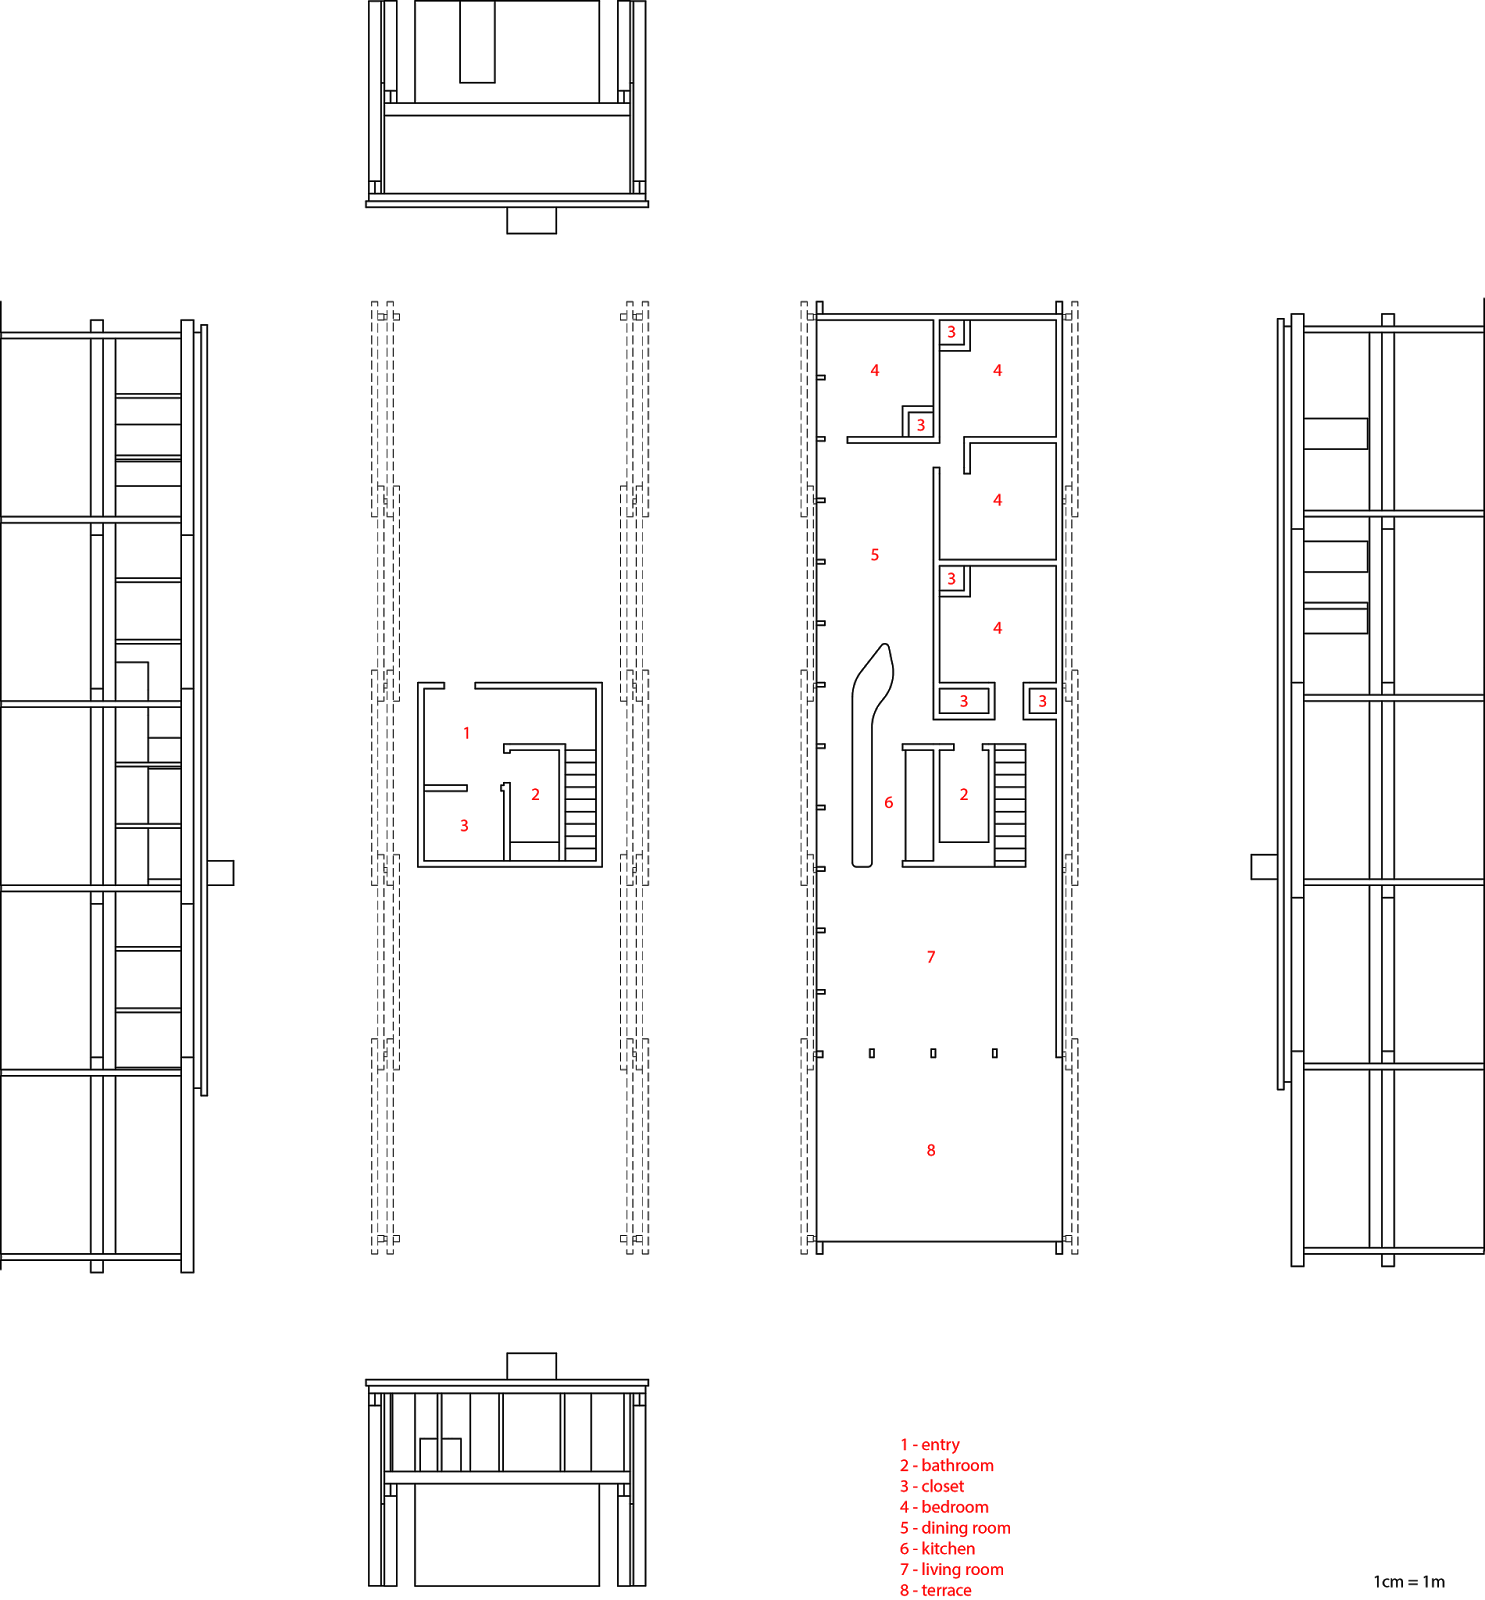 MiddelboeHouse_roomlabels Farnsworth House Floor Plan Diagram on german pavilion plan, farnsworth house interior, farnsworth house dimensions, farnsworth house elevation, farnsworth house bedroom, farnsworth house gettysburg, farnsworth house exterior, farnsworth house site plan, farnsworth house drawings, farnsworth house windows, farnsworth house ghosts, villa savoye floor plan, farnsworth house diagrams, farnsworth house model, barcelona pavilion floor plan, farnsworth glass house, farnsworth house illinois, farnsworth house flood, farnsworth house details, unity temple floor plan,